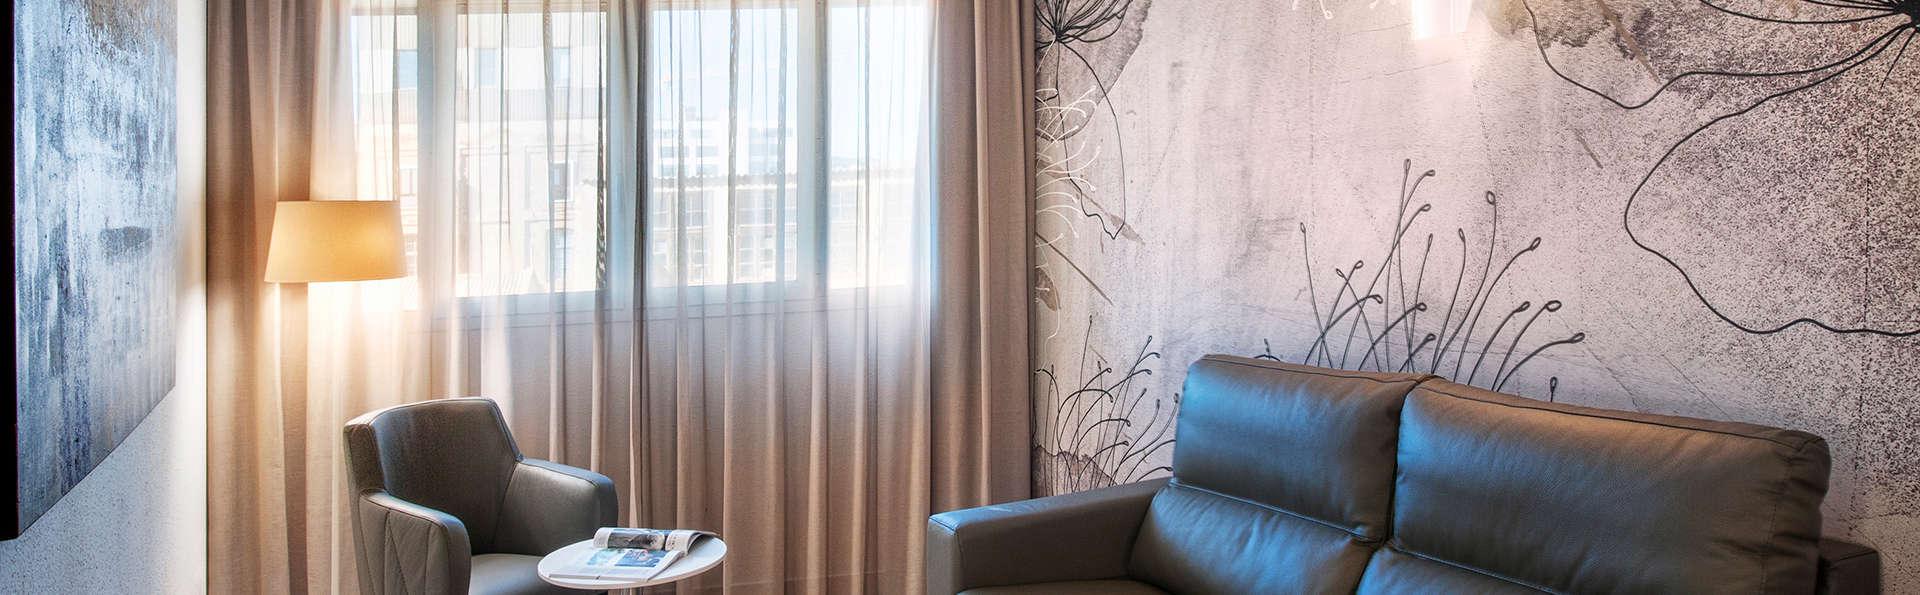 Sallés Hotel Pere IV 4* - Barcellona, Spagna